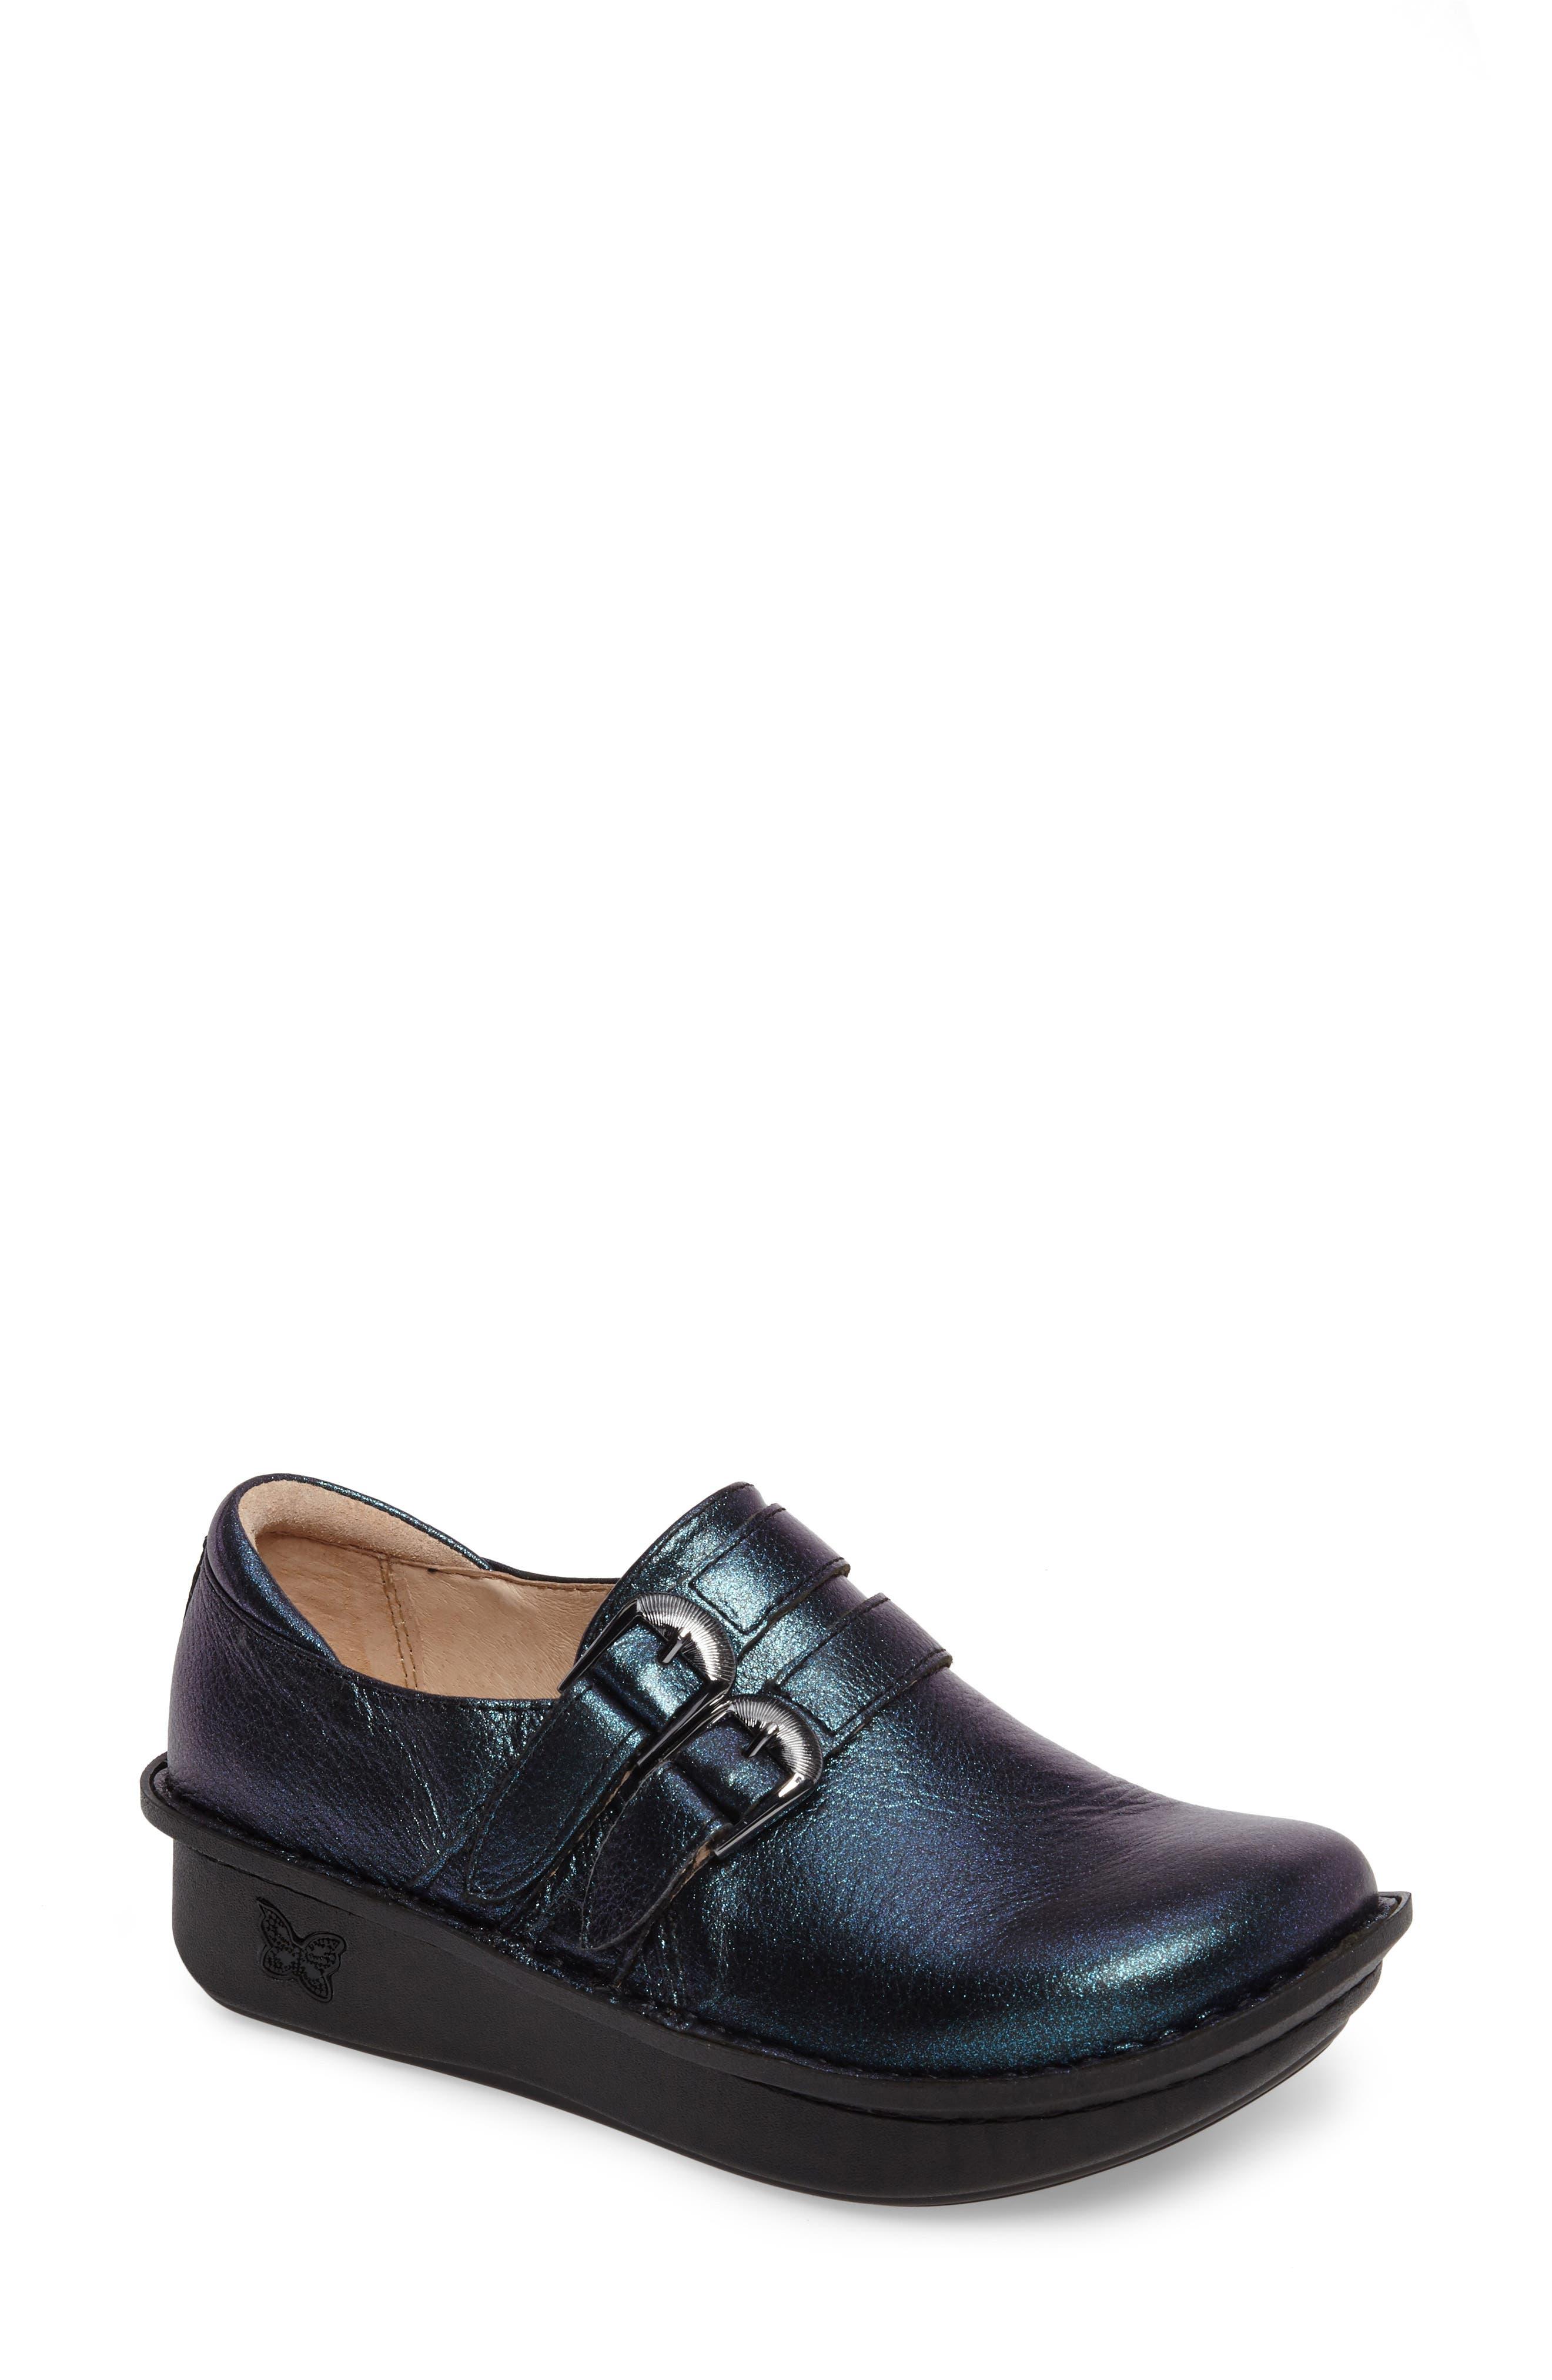 'Alli' Loafer,                         Main,                         color, Starlit Leather